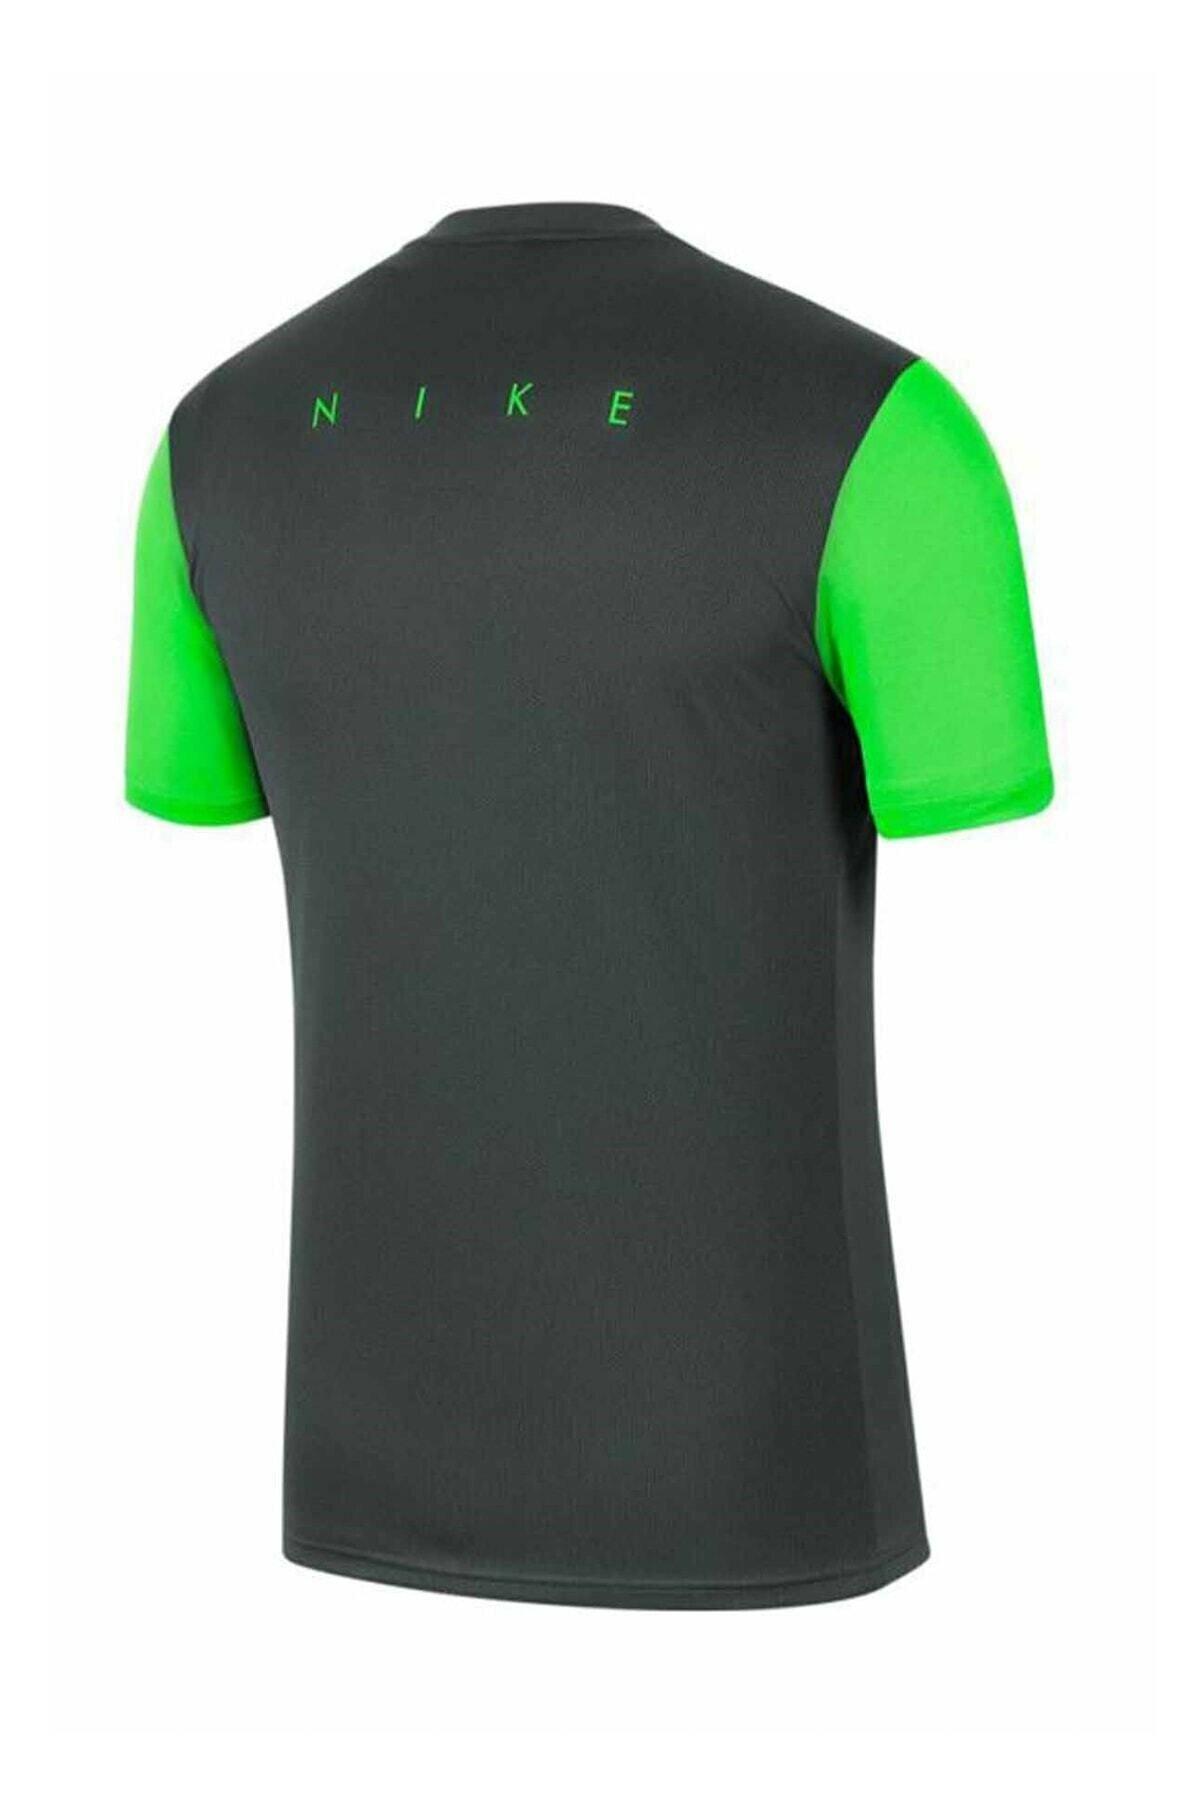 Dri-Fit Academy Pro Erkek Yeşil Spor Tişört (BV6926-074)